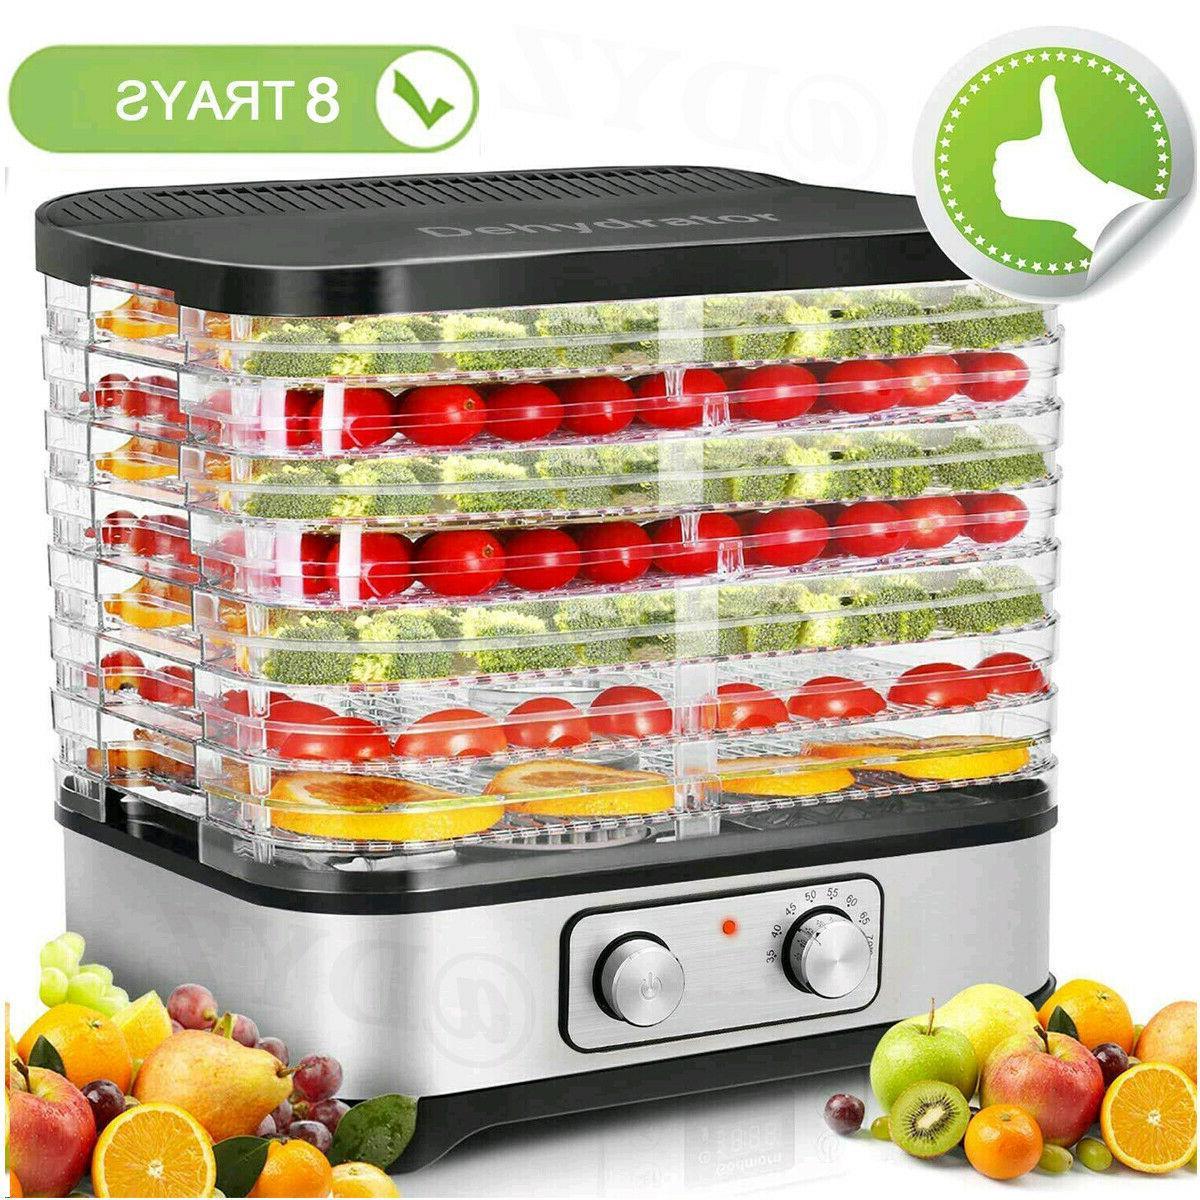 Homdox 8 Trays Food Dehydrator Machine Jerky/Meat/Beef/Fruit